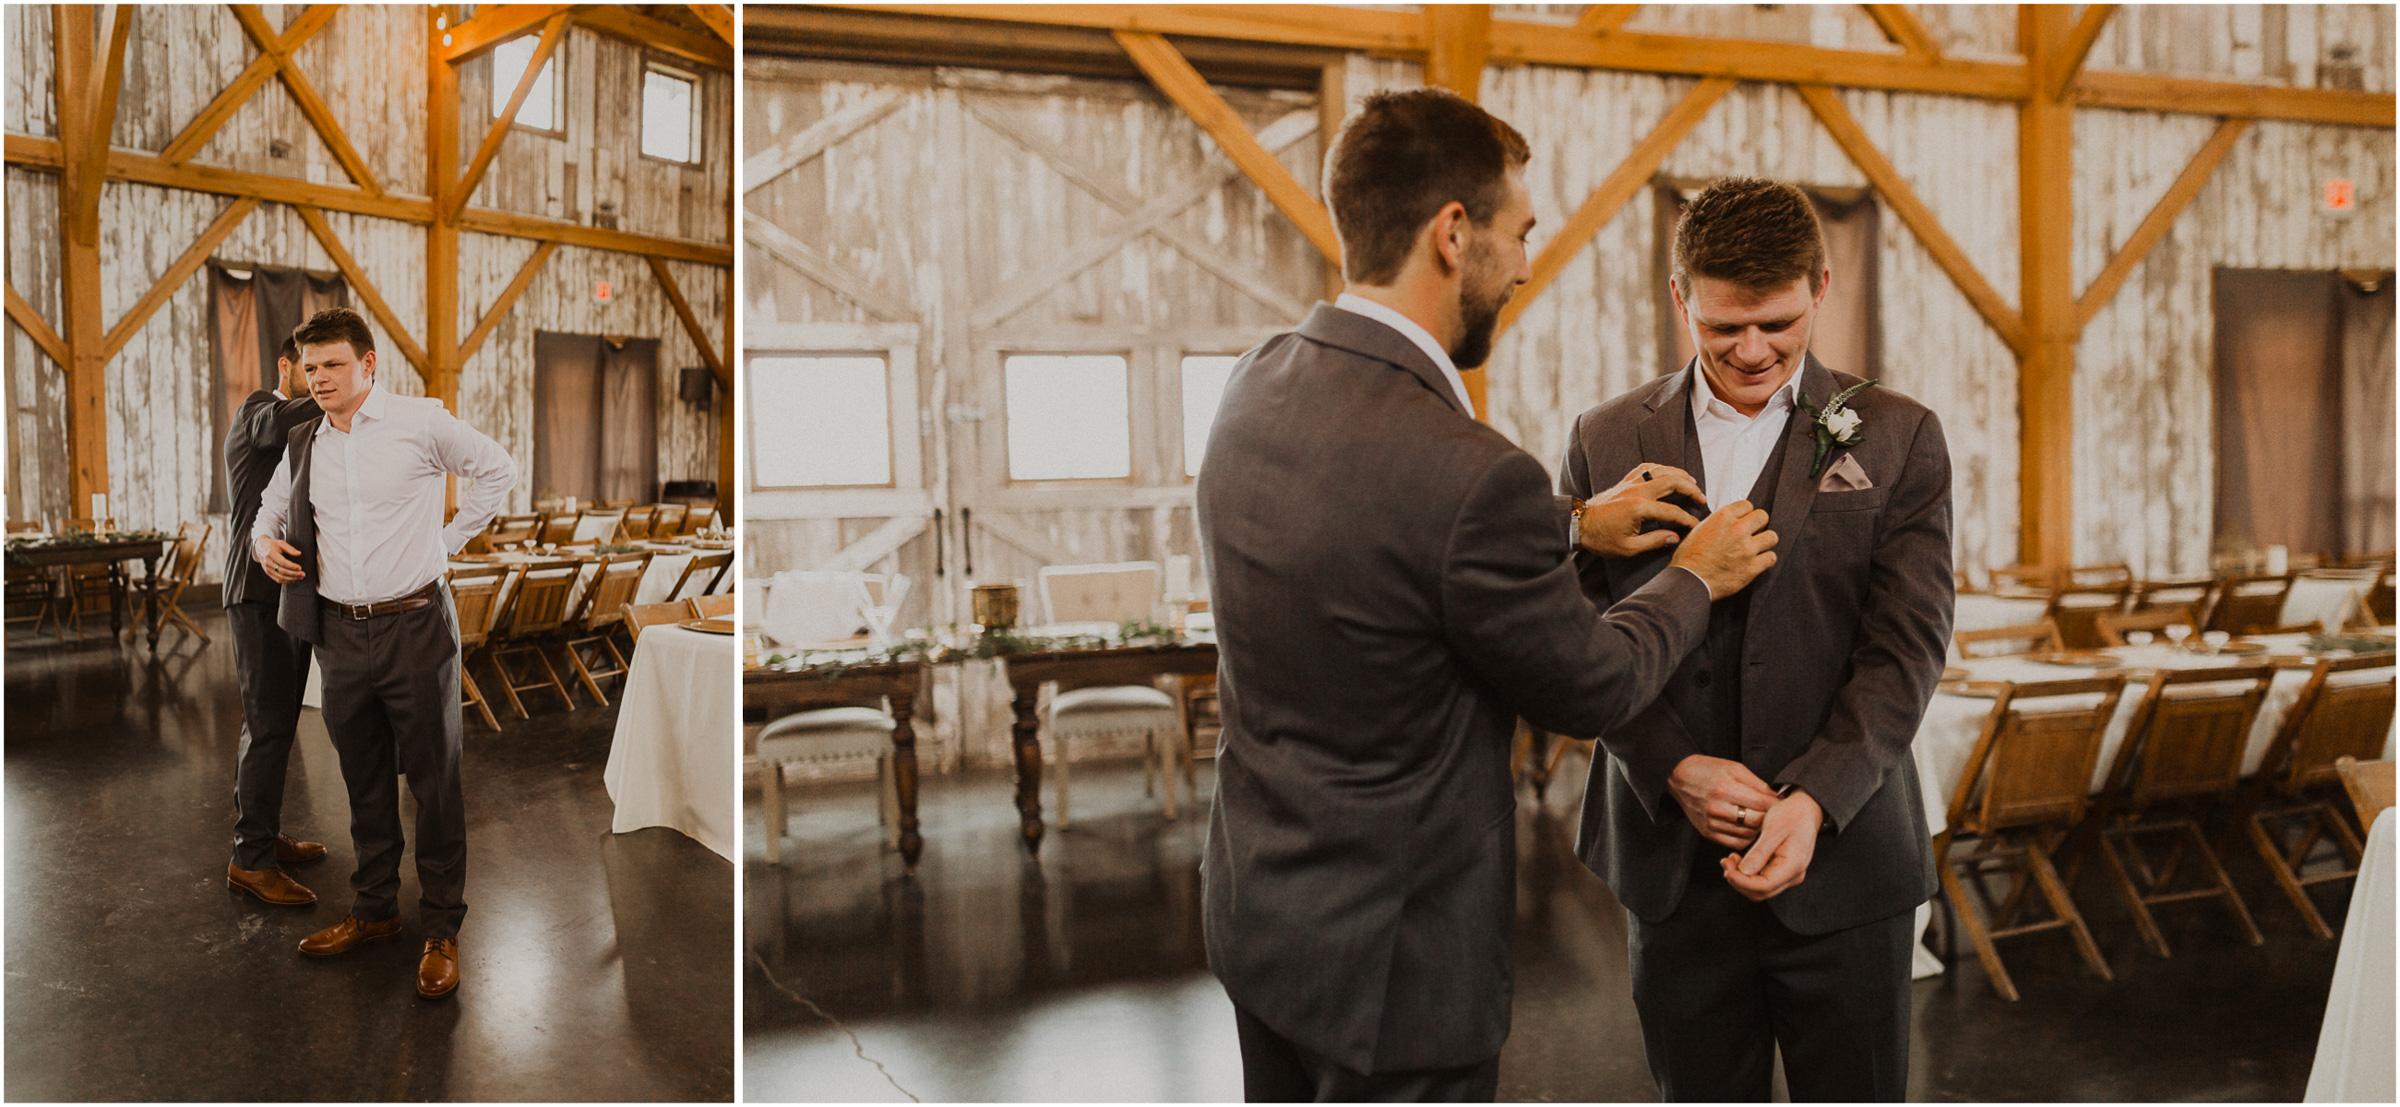 alyssa barletter photography weston red barn farm timberbarn summer outdoor wedding-8.jpg